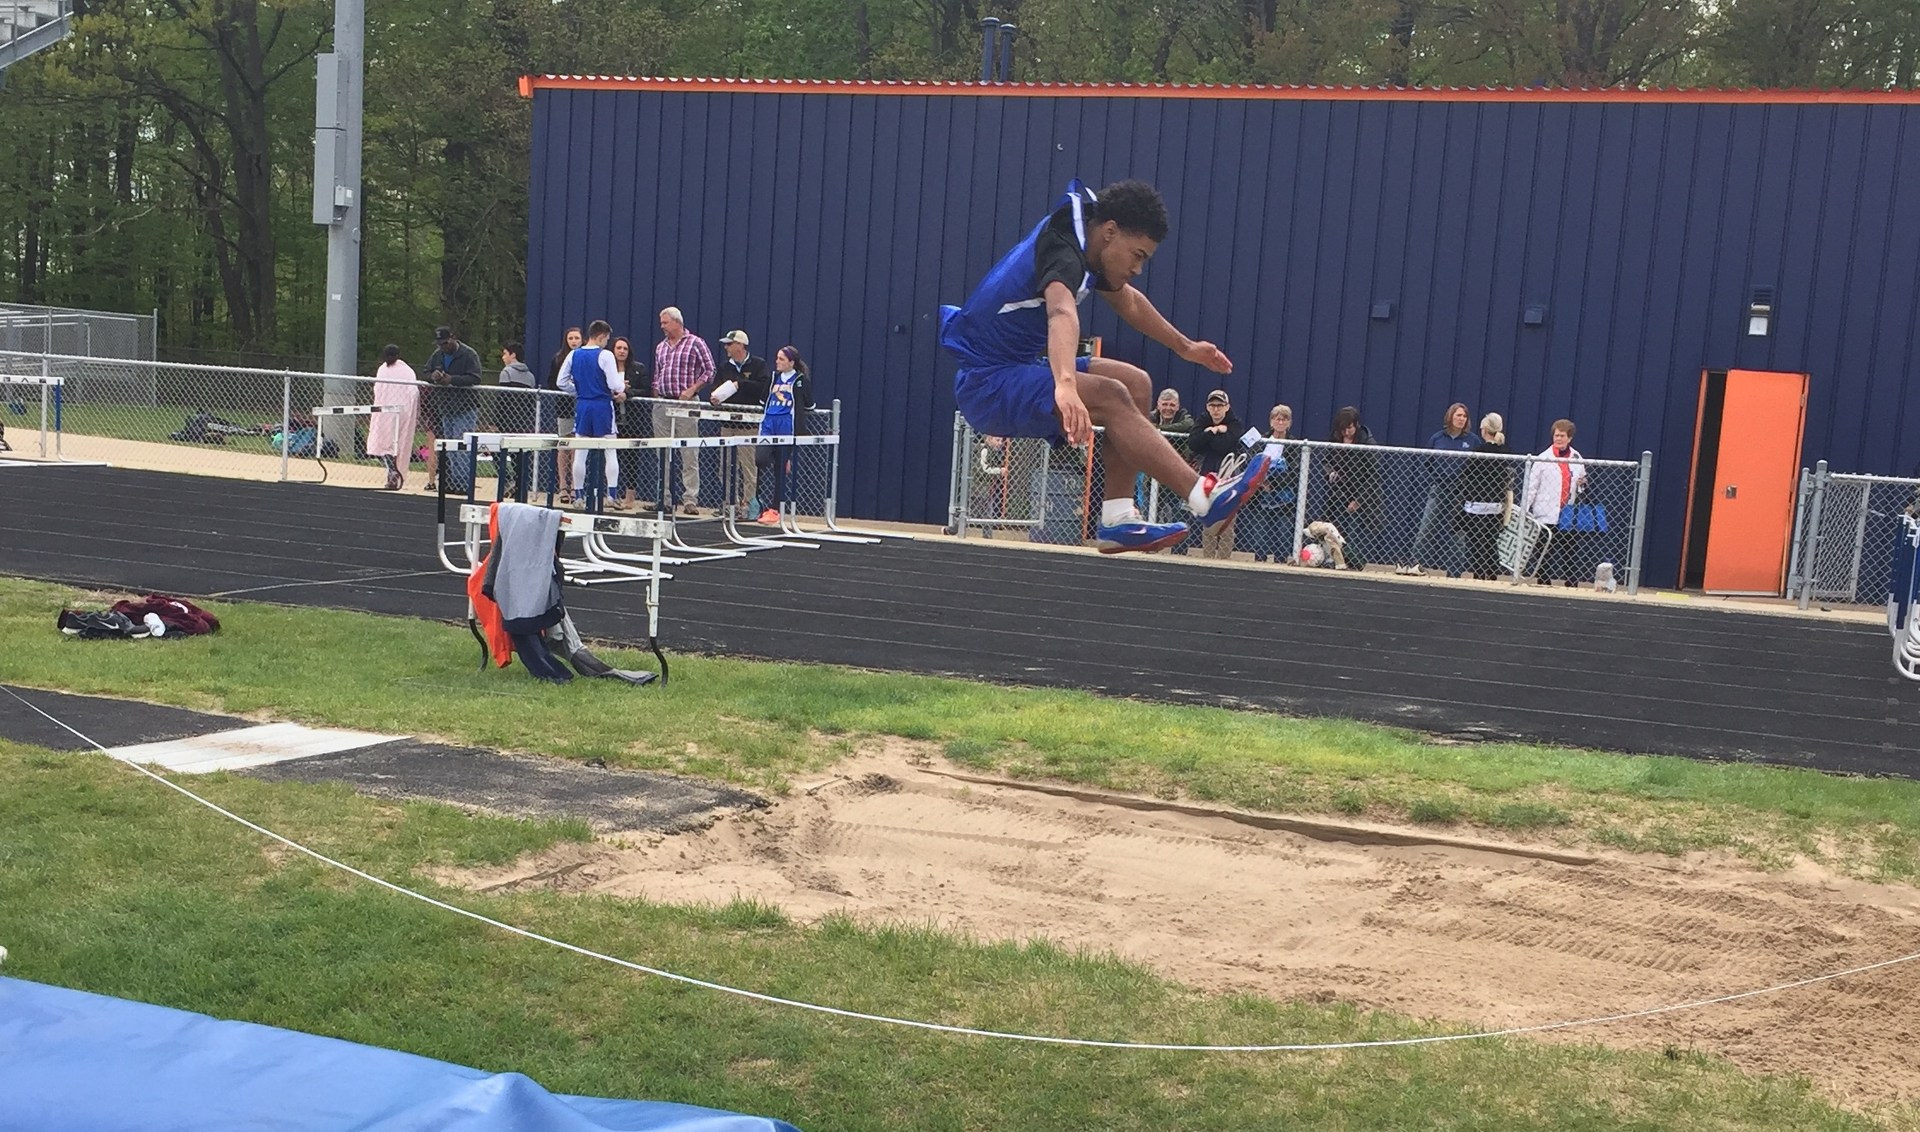 Student Long Jumping